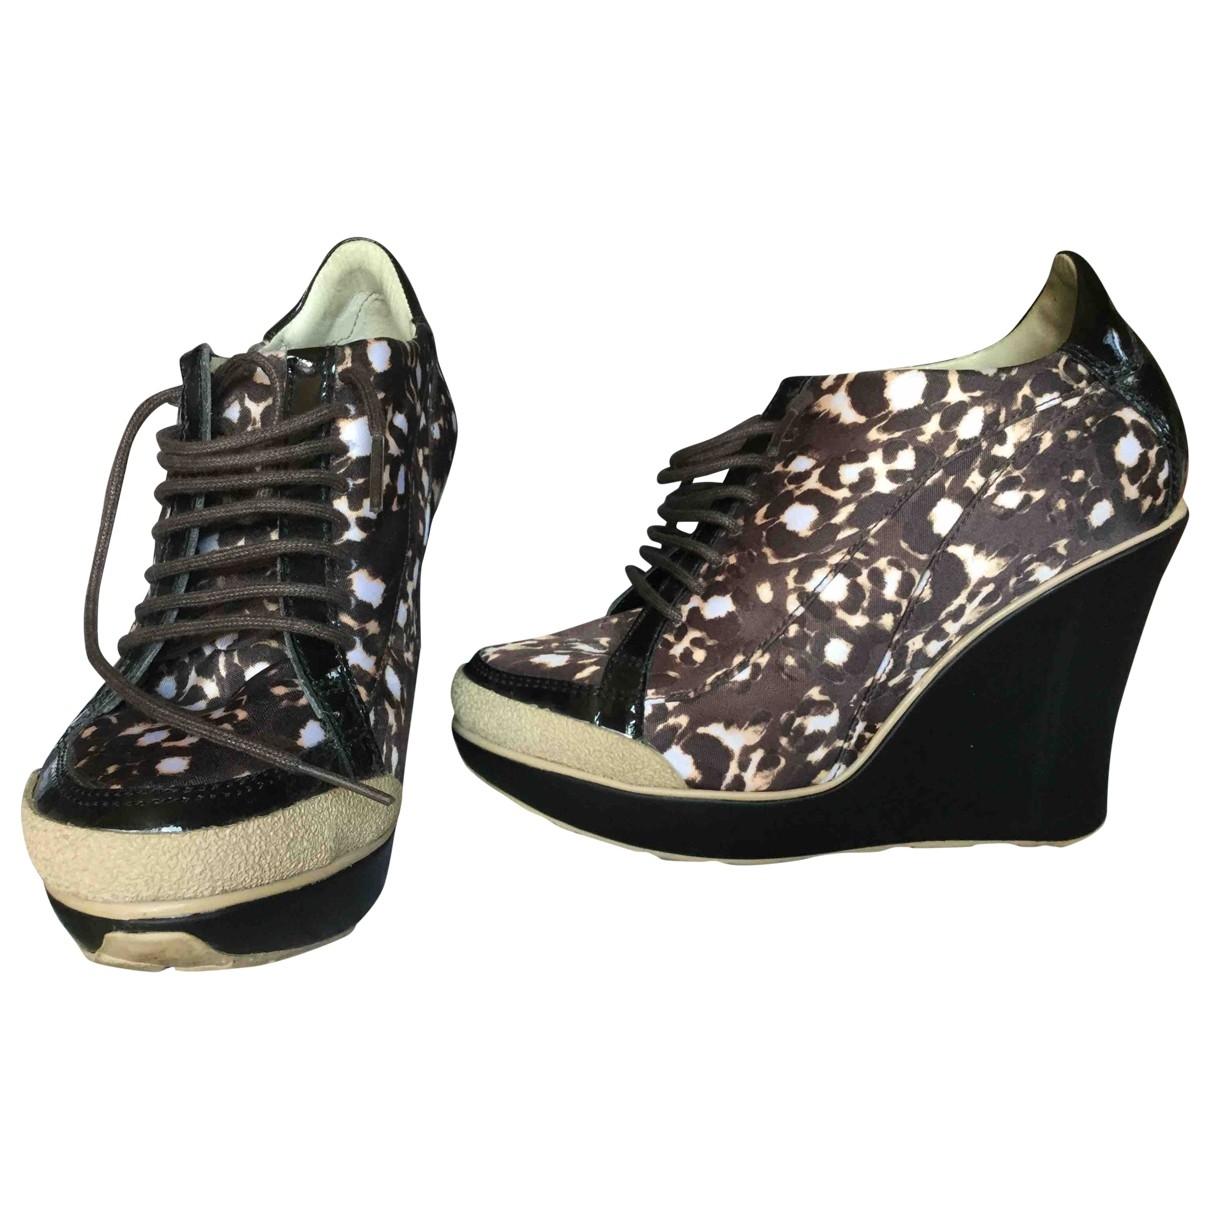 Just Cavalli \N Multicolour Faux fur Heels for Women 36 EU